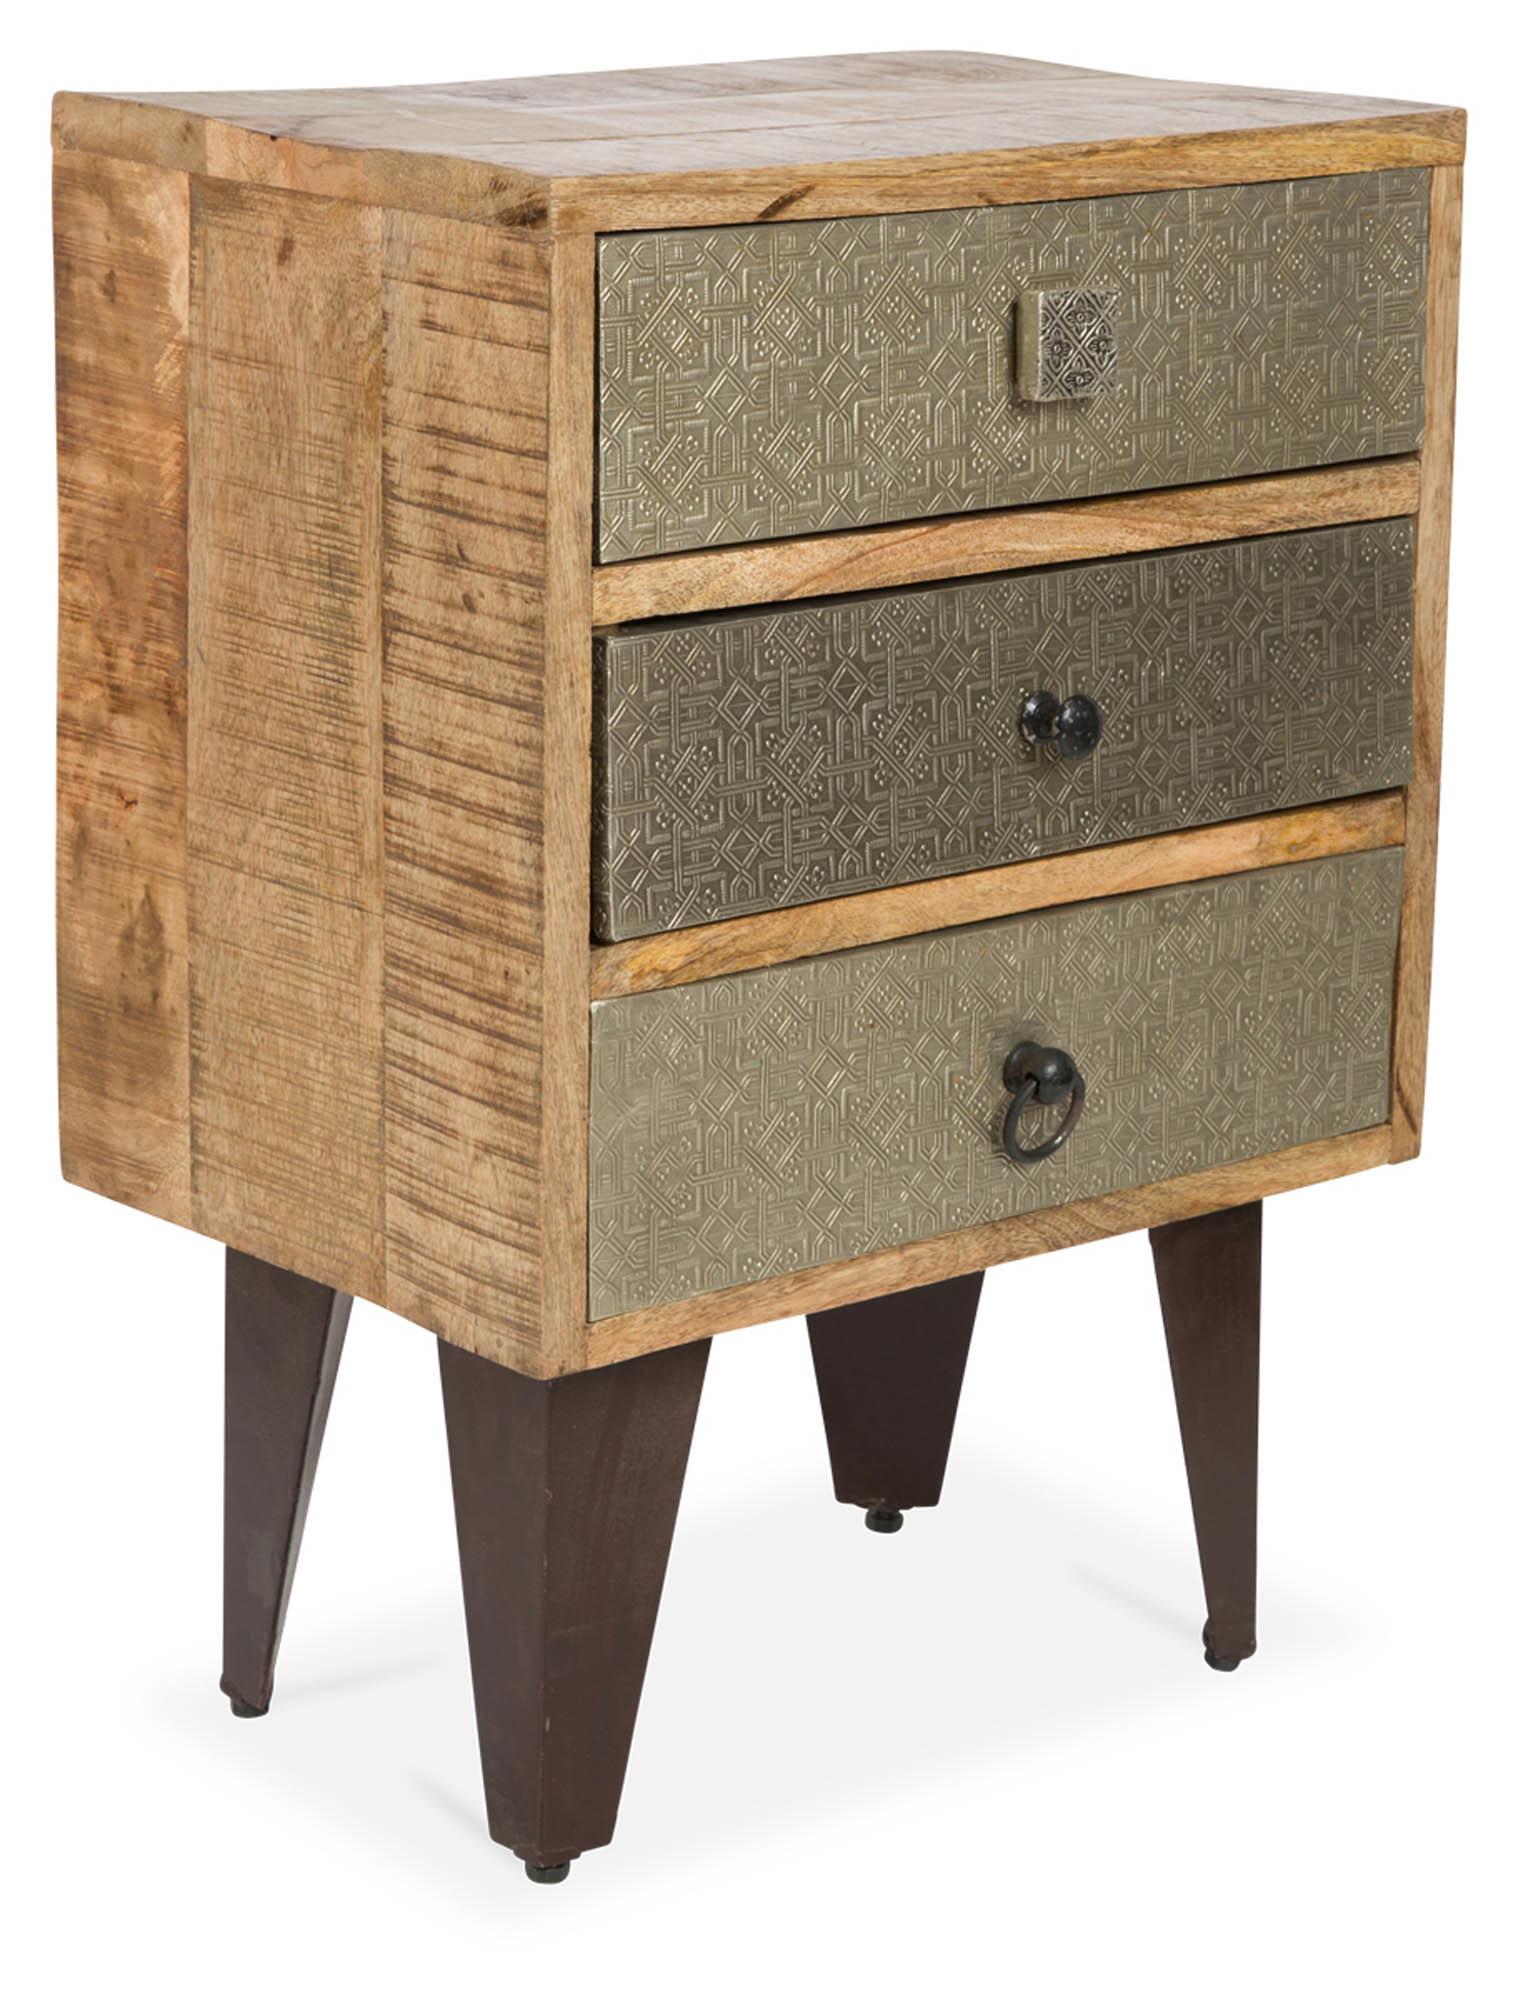 pressed metal furniture. SKU #CAS1722 Jojo 3 Drawer Pressed Metal \u0026 Wood Bedside Table Is Also Sometimes Listed Under The Following Manufacturer Numbers: SK01 Furniture P